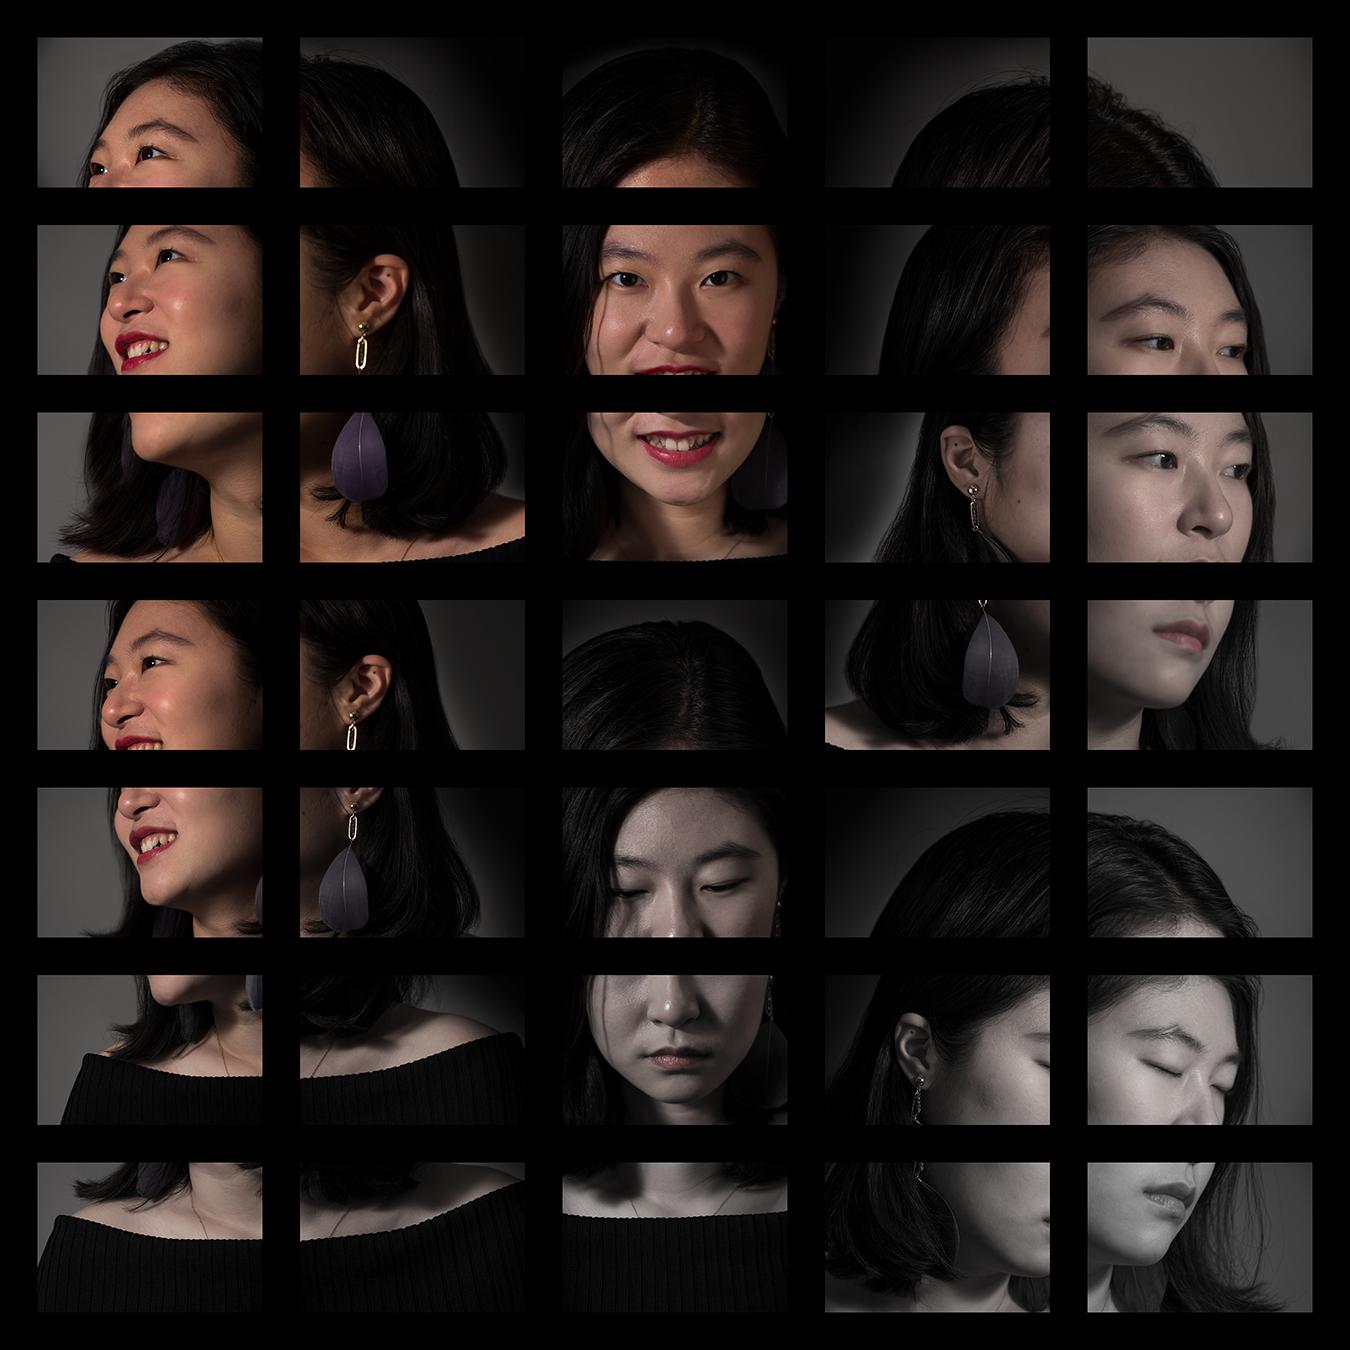 WENJIA_GUO_PORTRAITURE_EMOTIONAL_CHANGE_tony_ward_studio